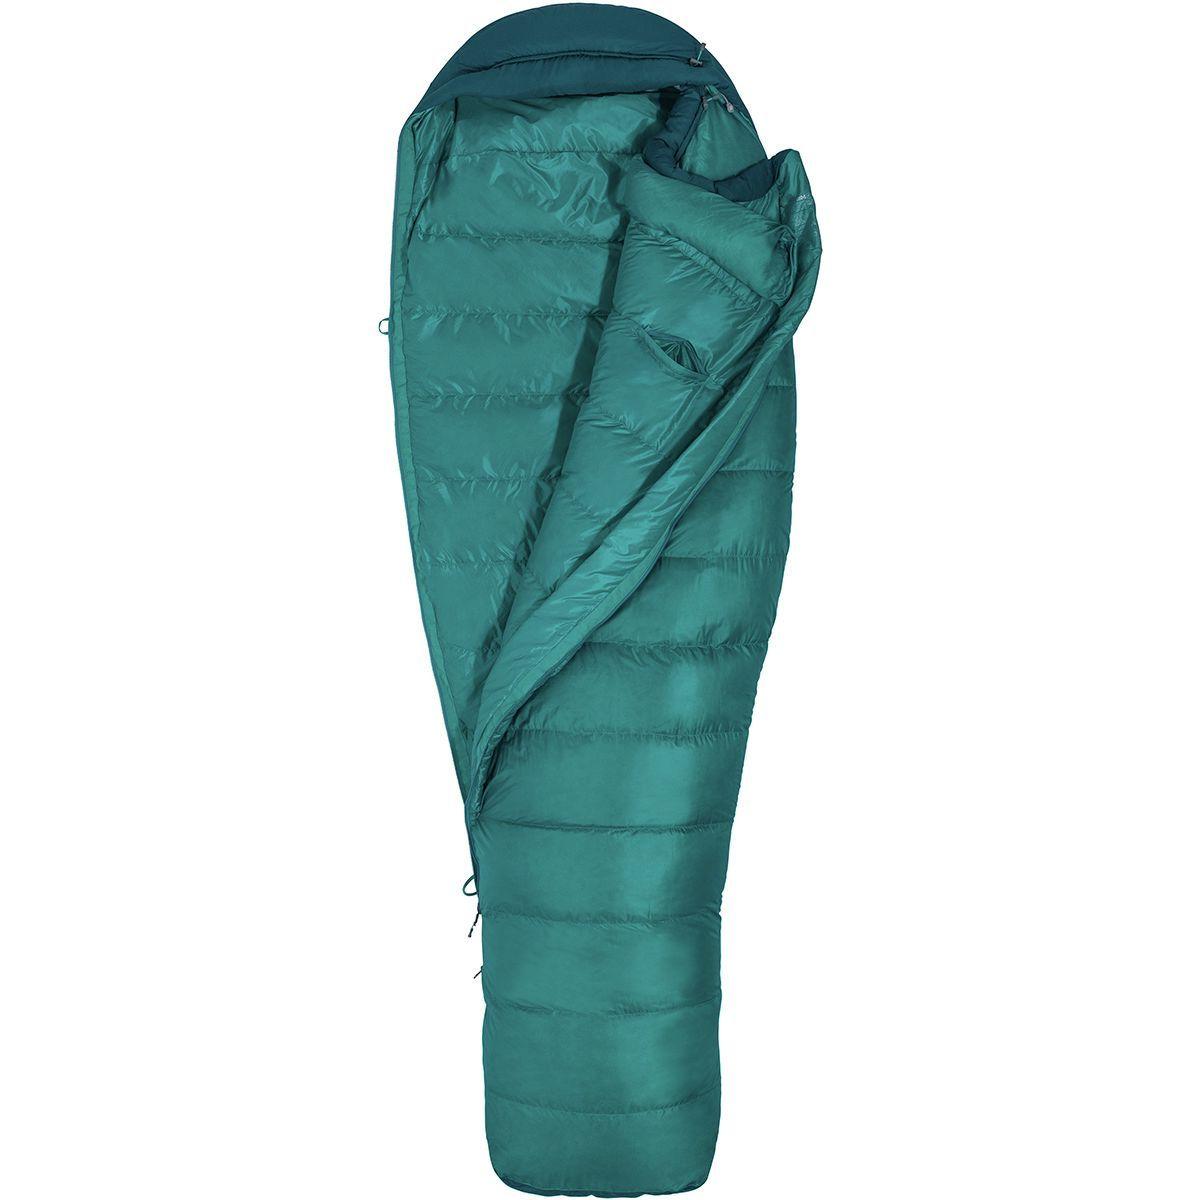 Marmot Angel Fire Sleeping Bag: 25 Degree Down - Women's